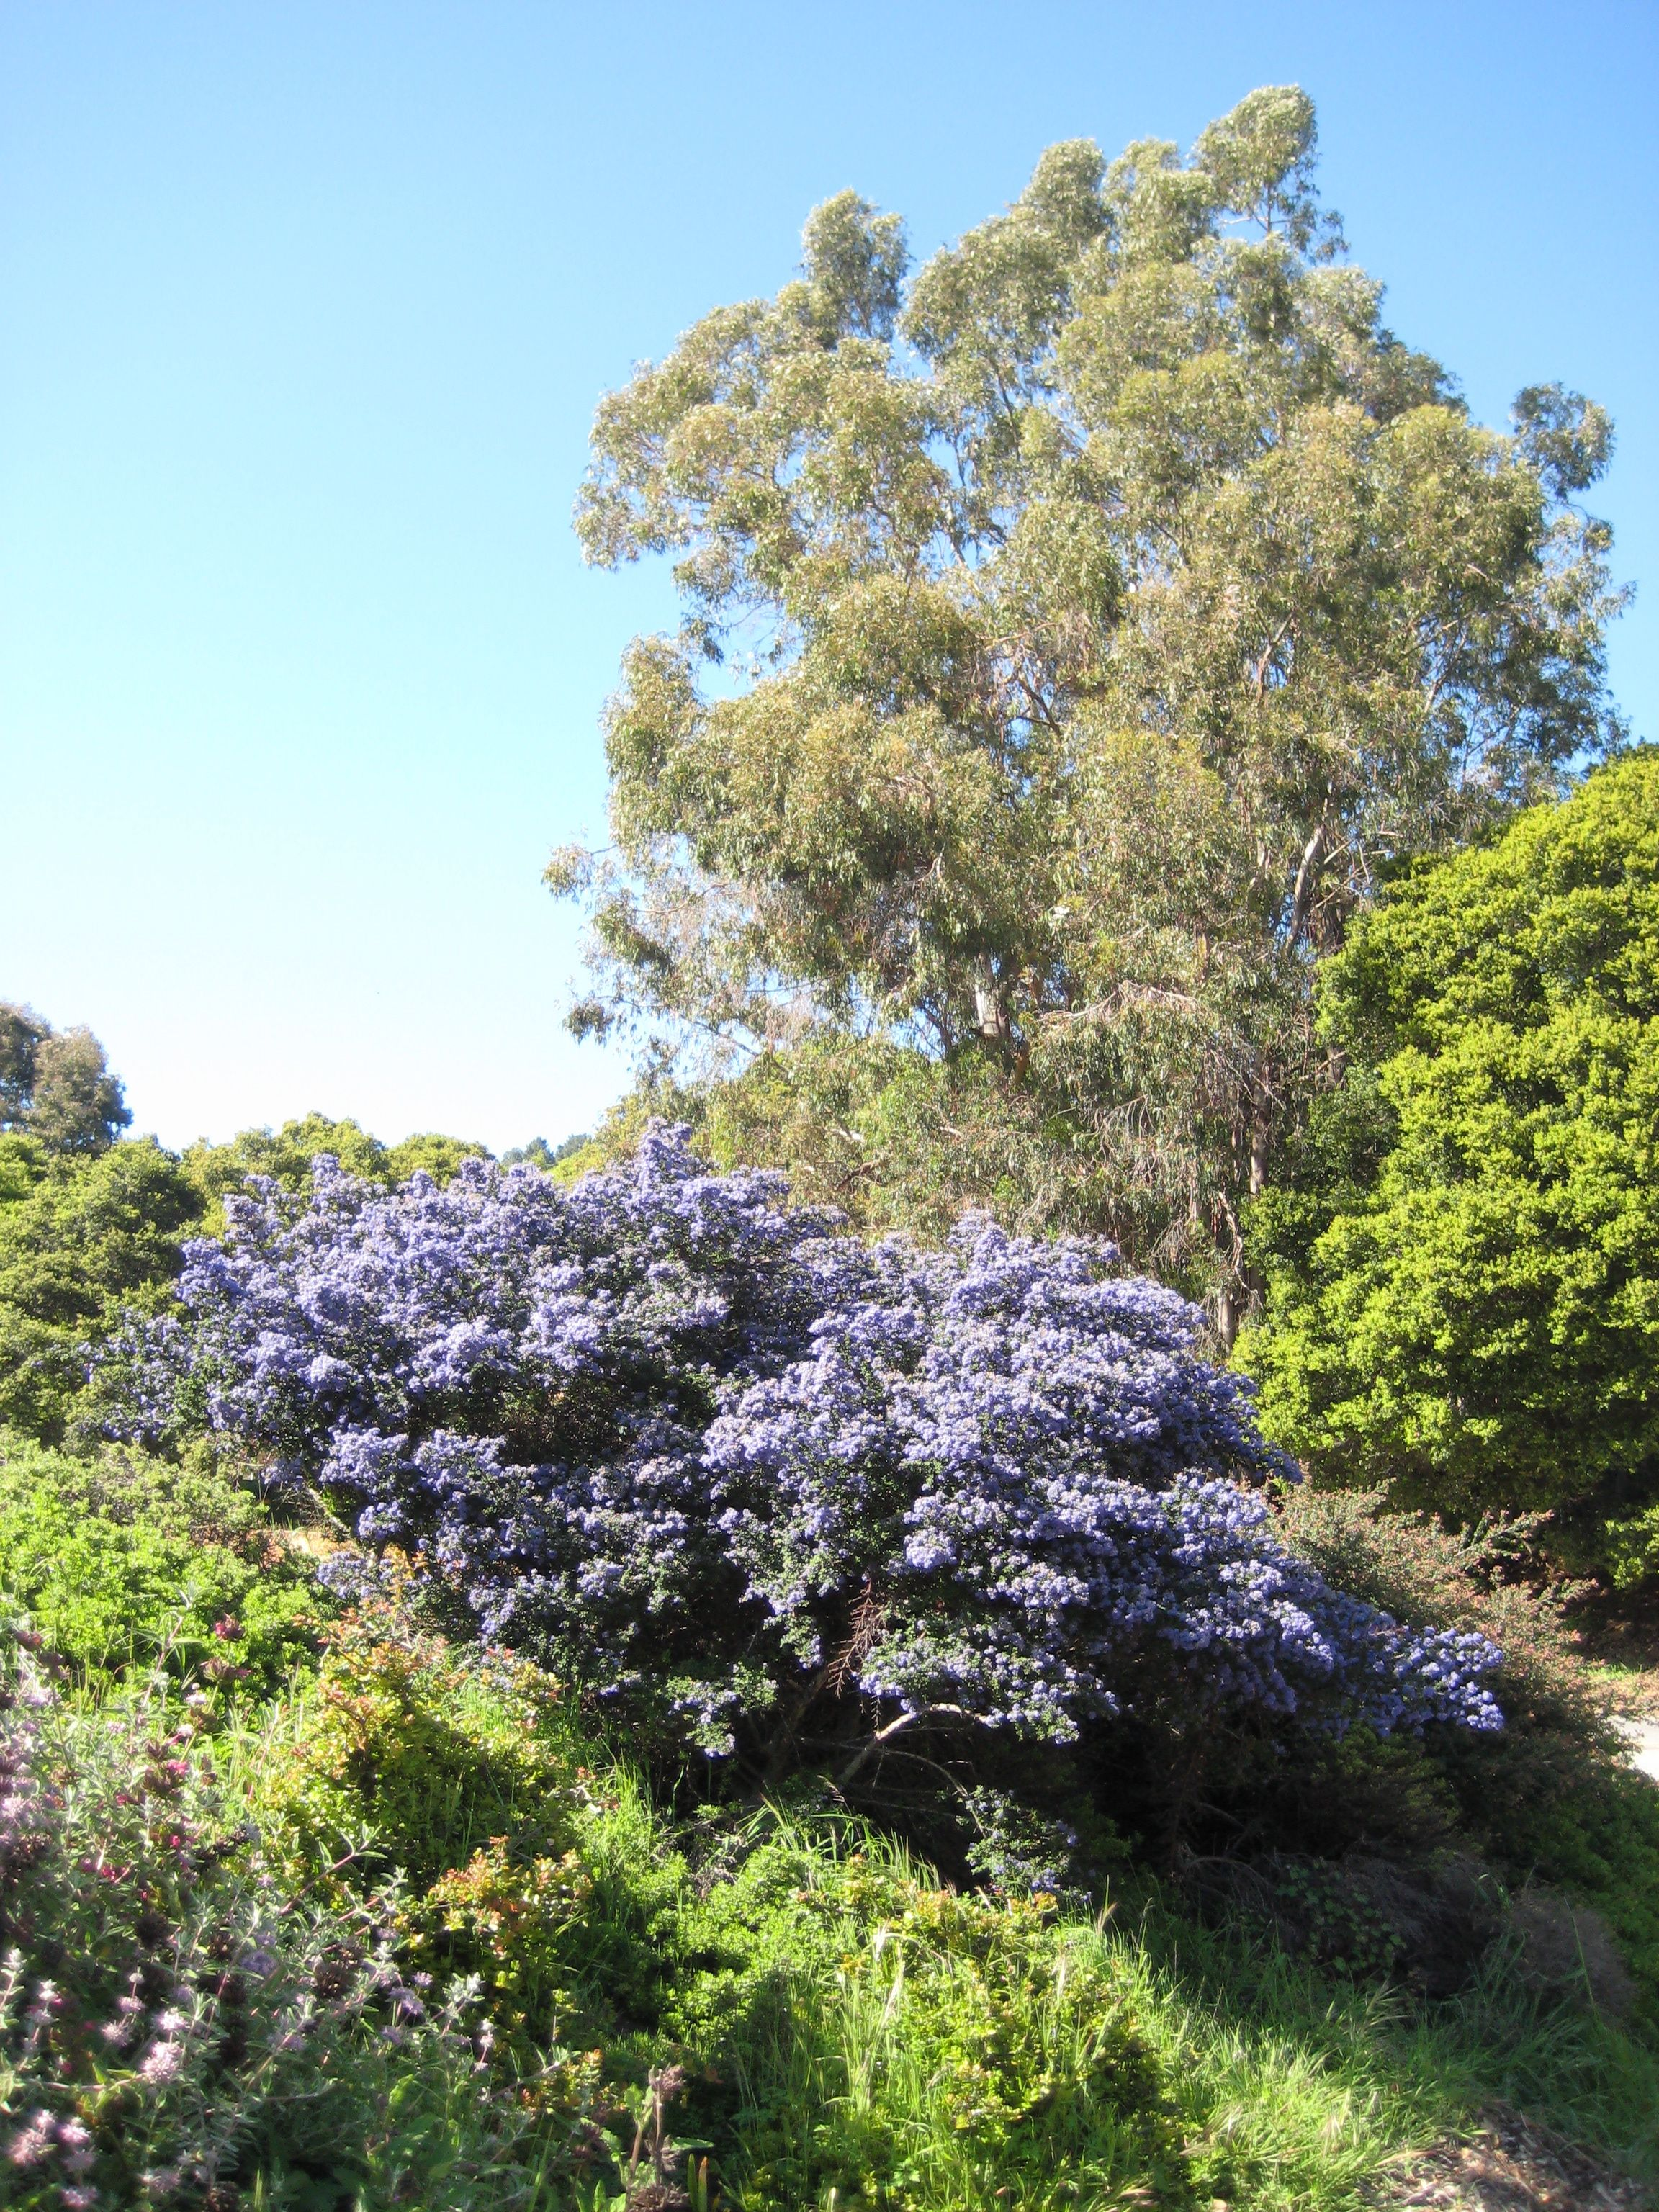 University of California at Berkeley Botanical Garden